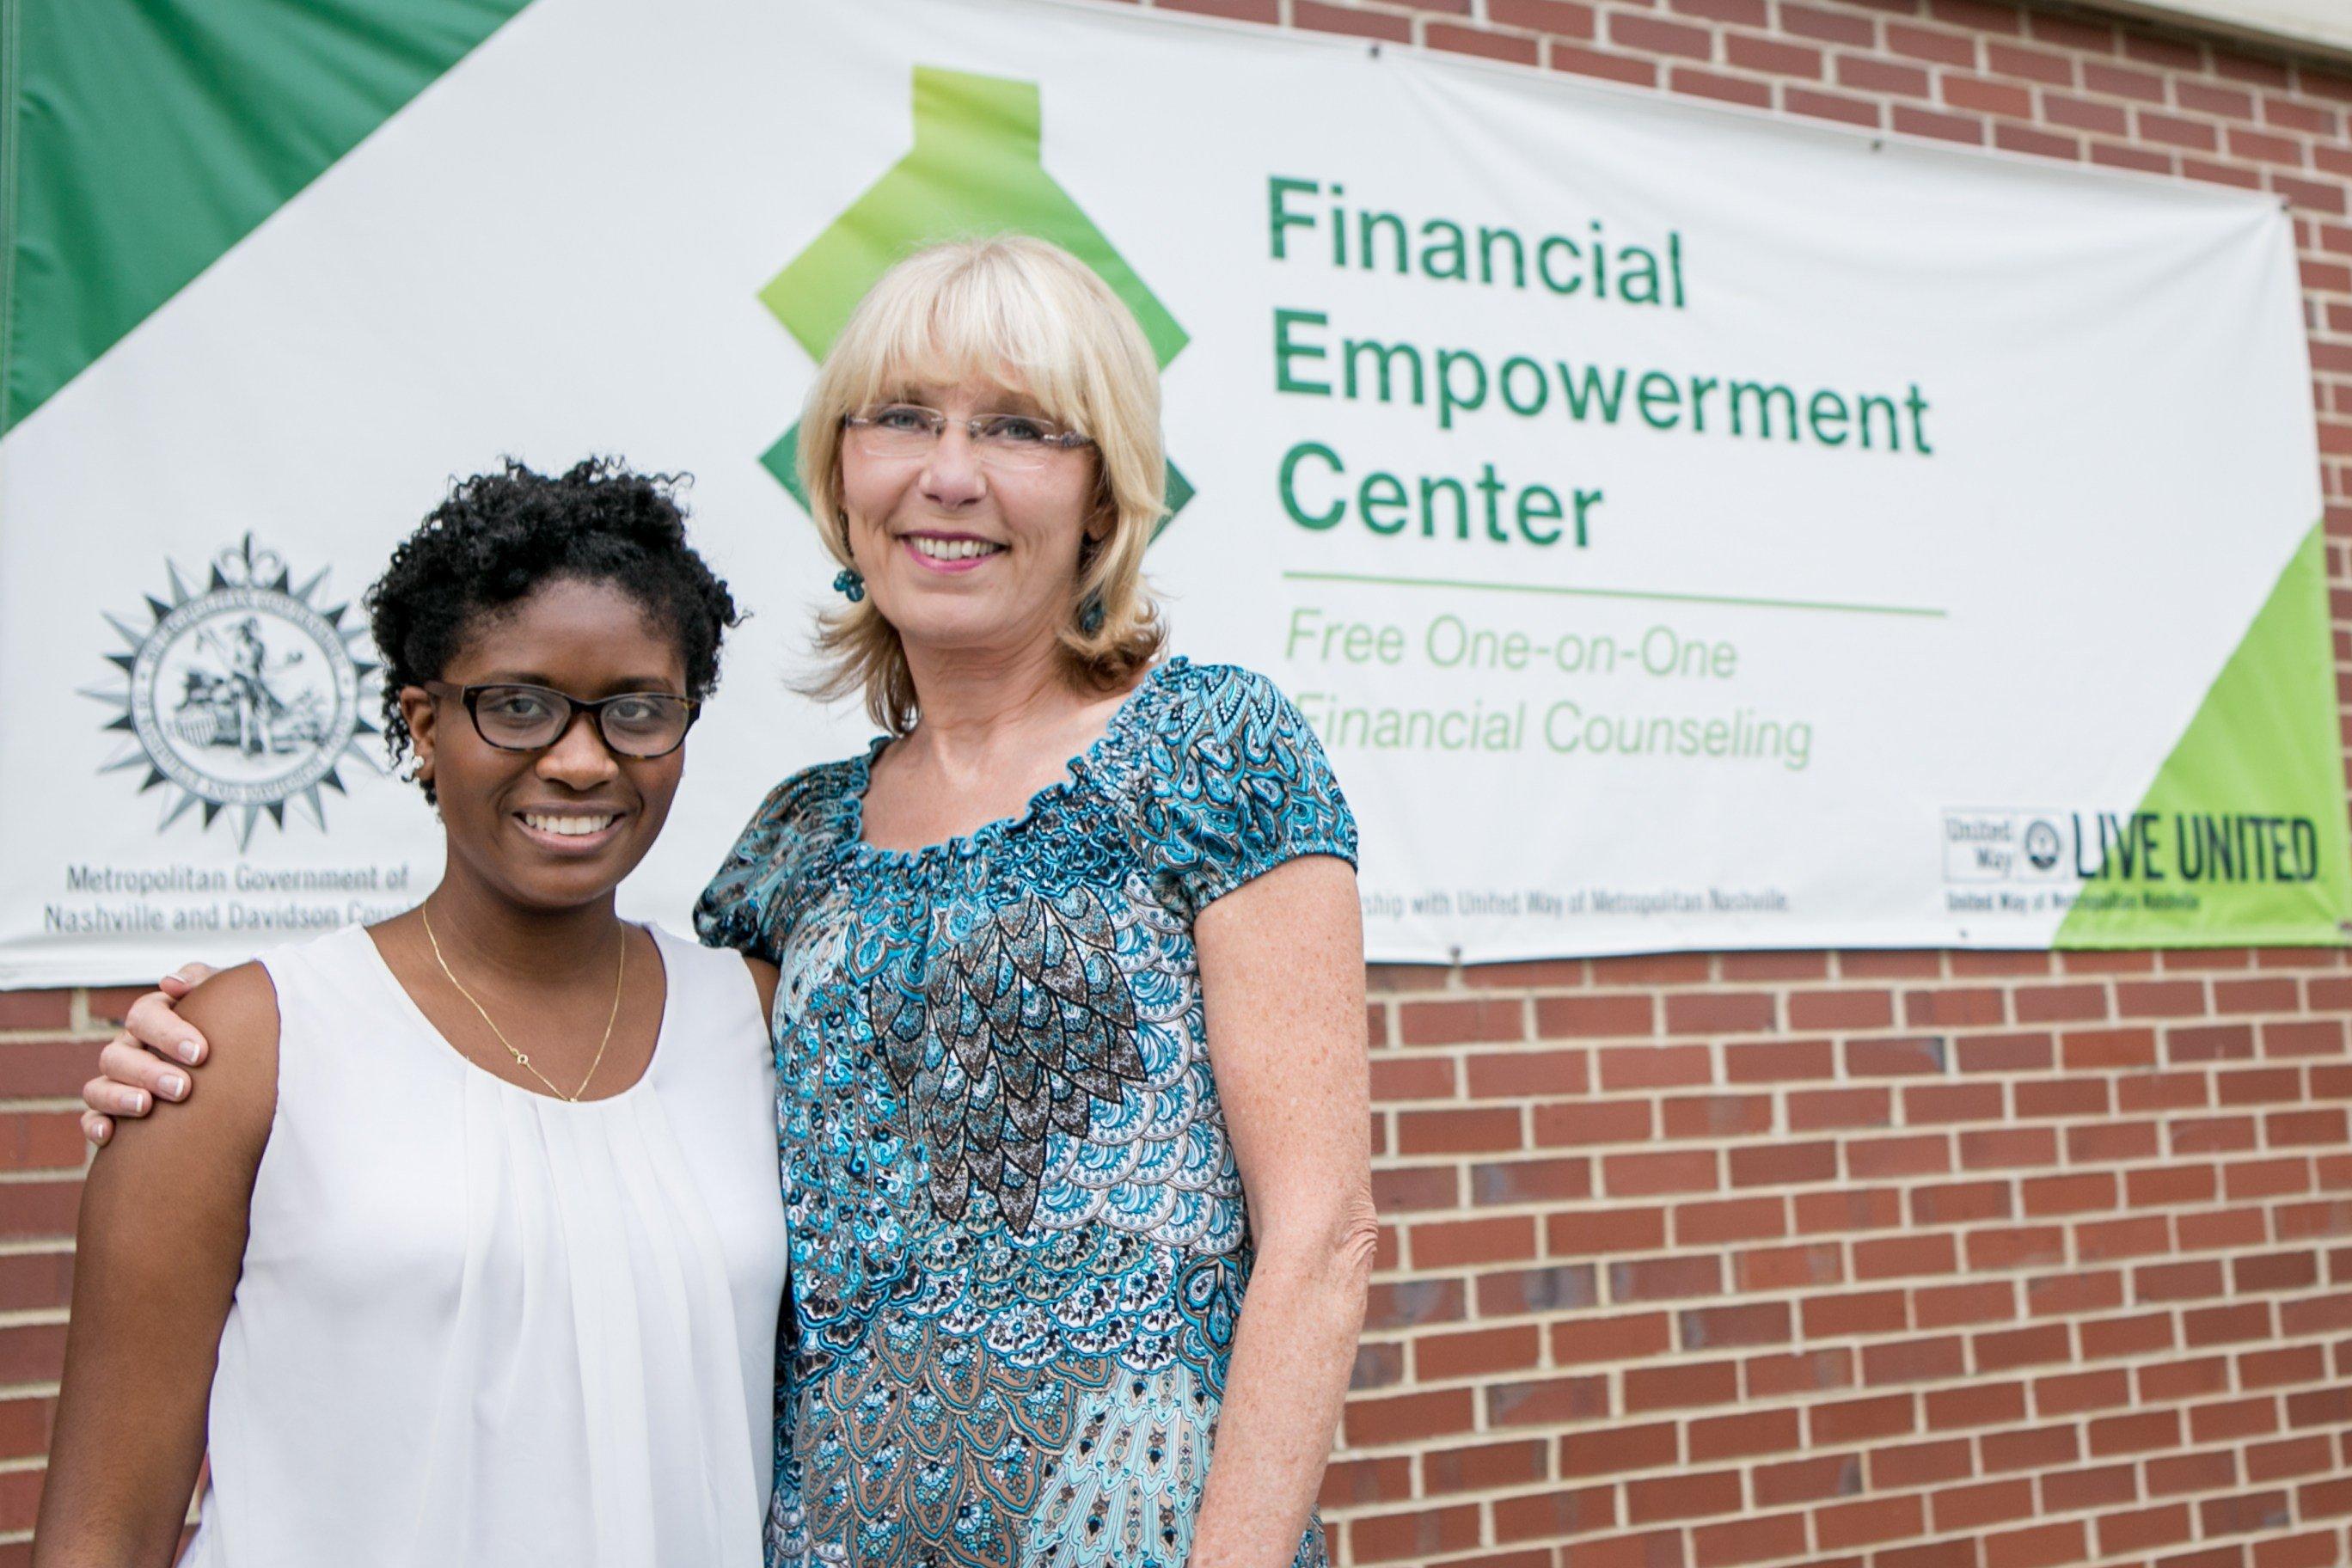 Financial Empowerment Center (Source: CFE Fund)